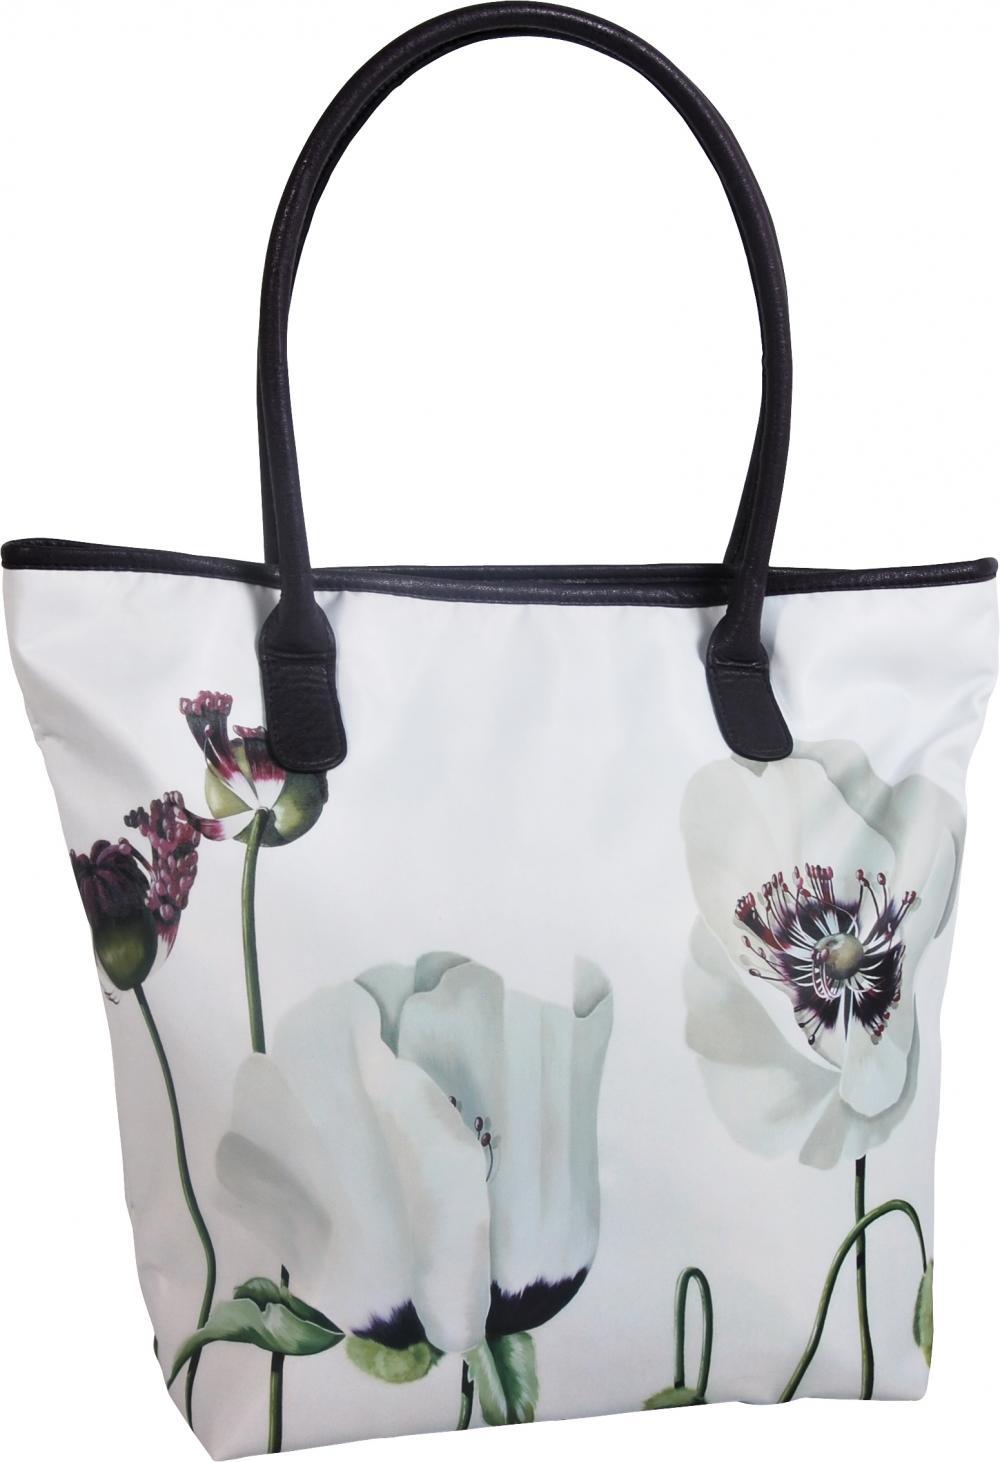 zzGeanta shopping Satin,43.5x36x13cm,alb